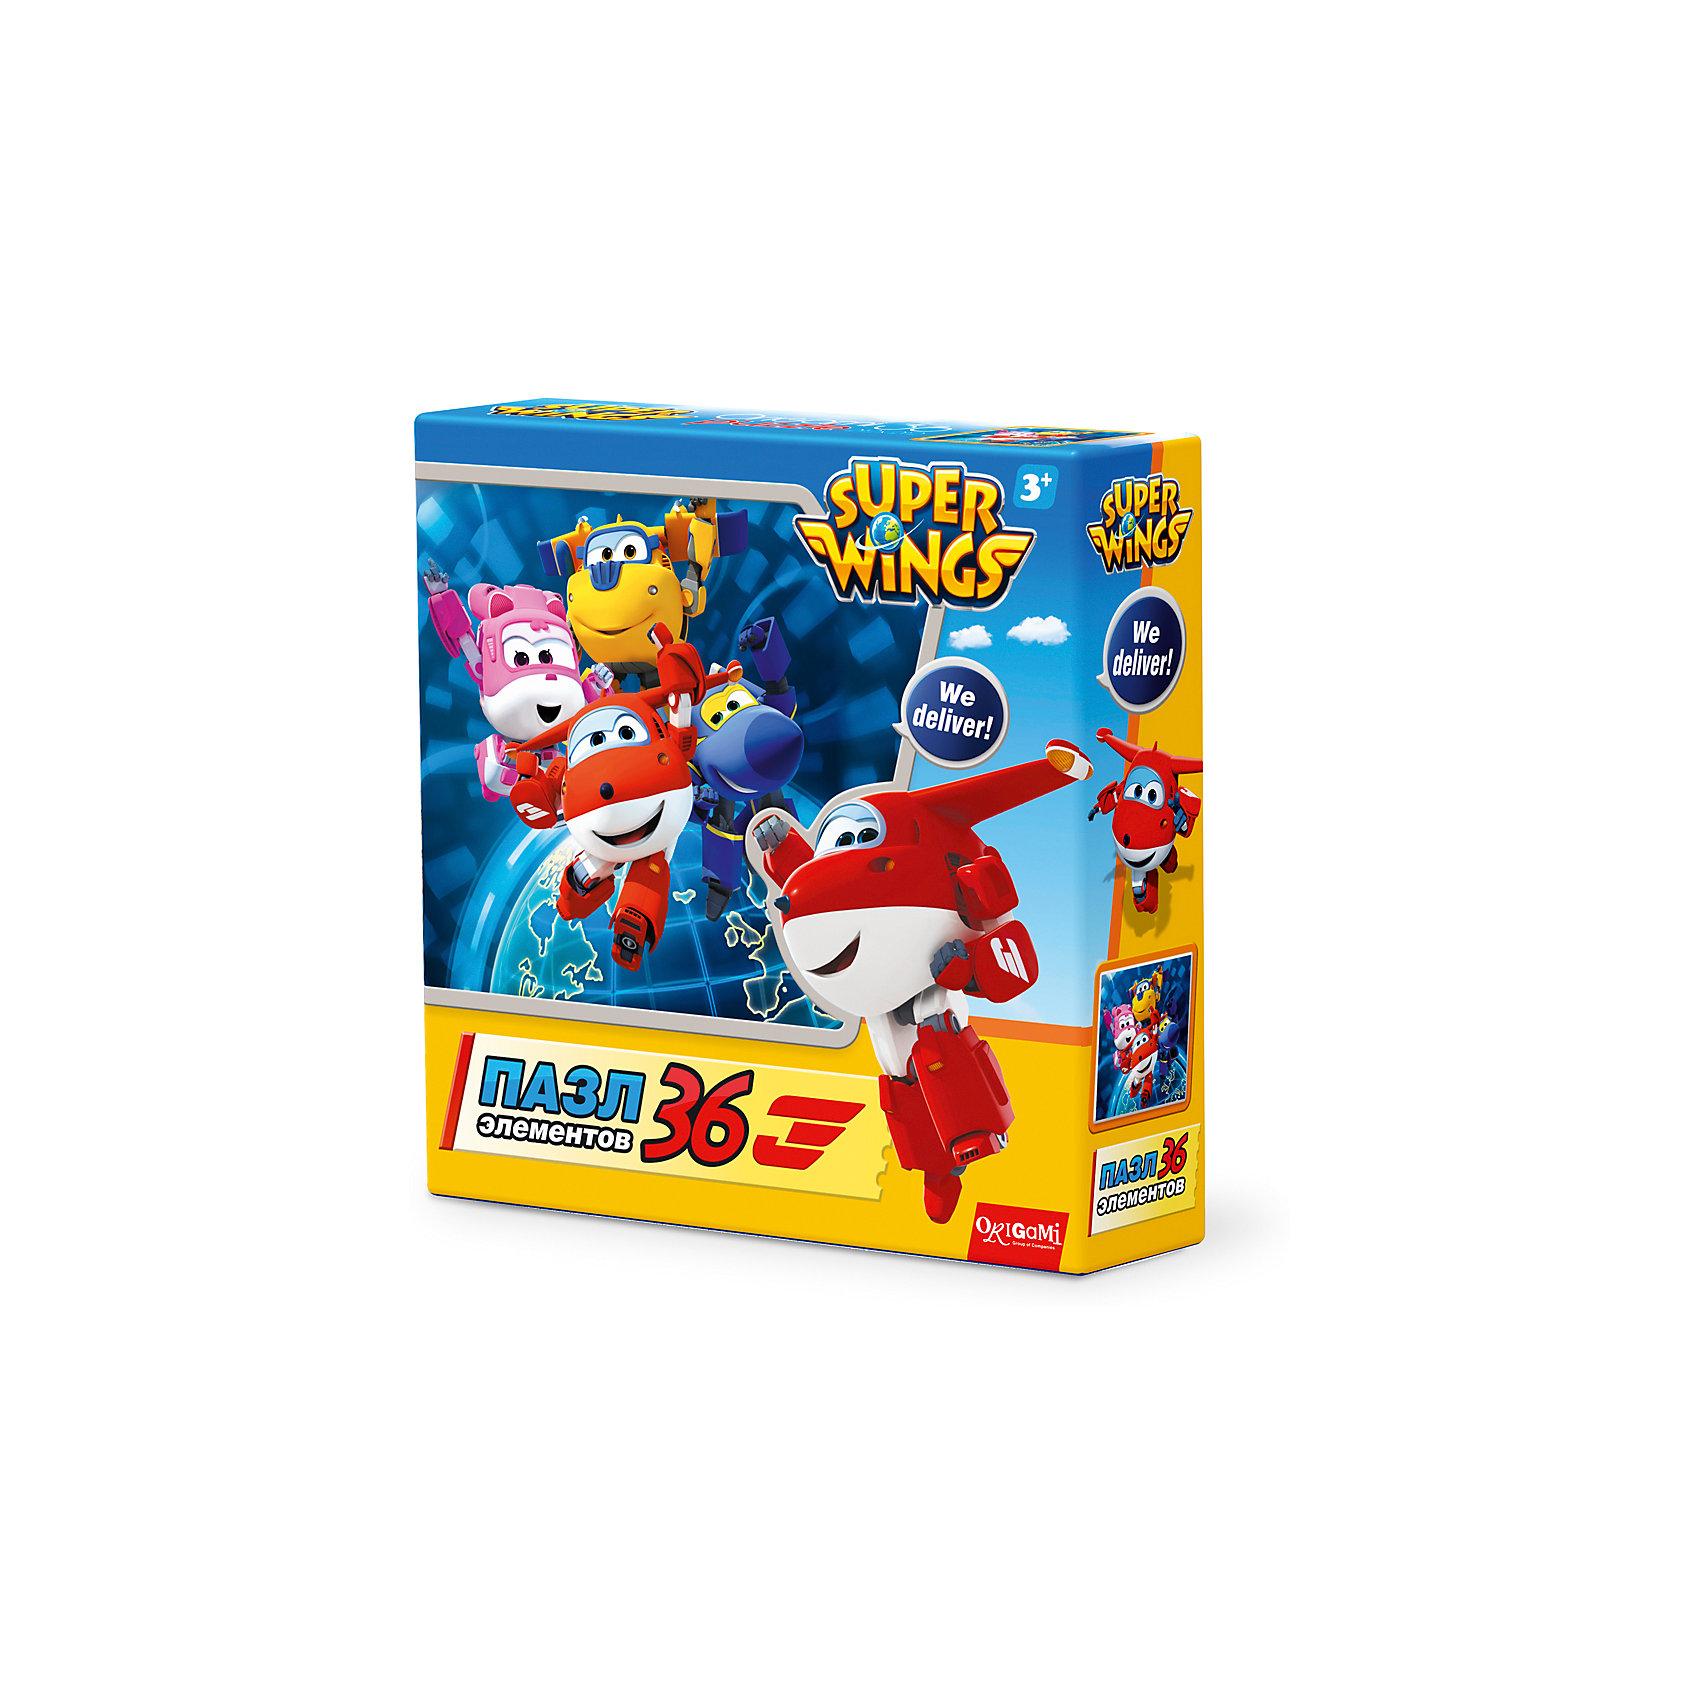 Пазл We deliver!, Super Wings, OrigamiПазлы для малышей<br>Пазл 36 элементов. Комплектность: поле (220х220). Рекомендованный возраст 3+.<br><br>Ширина мм: 150<br>Глубина мм: 45<br>Высота мм: 150<br>Вес г: 100<br>Возраст от месяцев: 36<br>Возраст до месяцев: 72<br>Пол: Унисекс<br>Возраст: Детский<br>SKU: 5528430